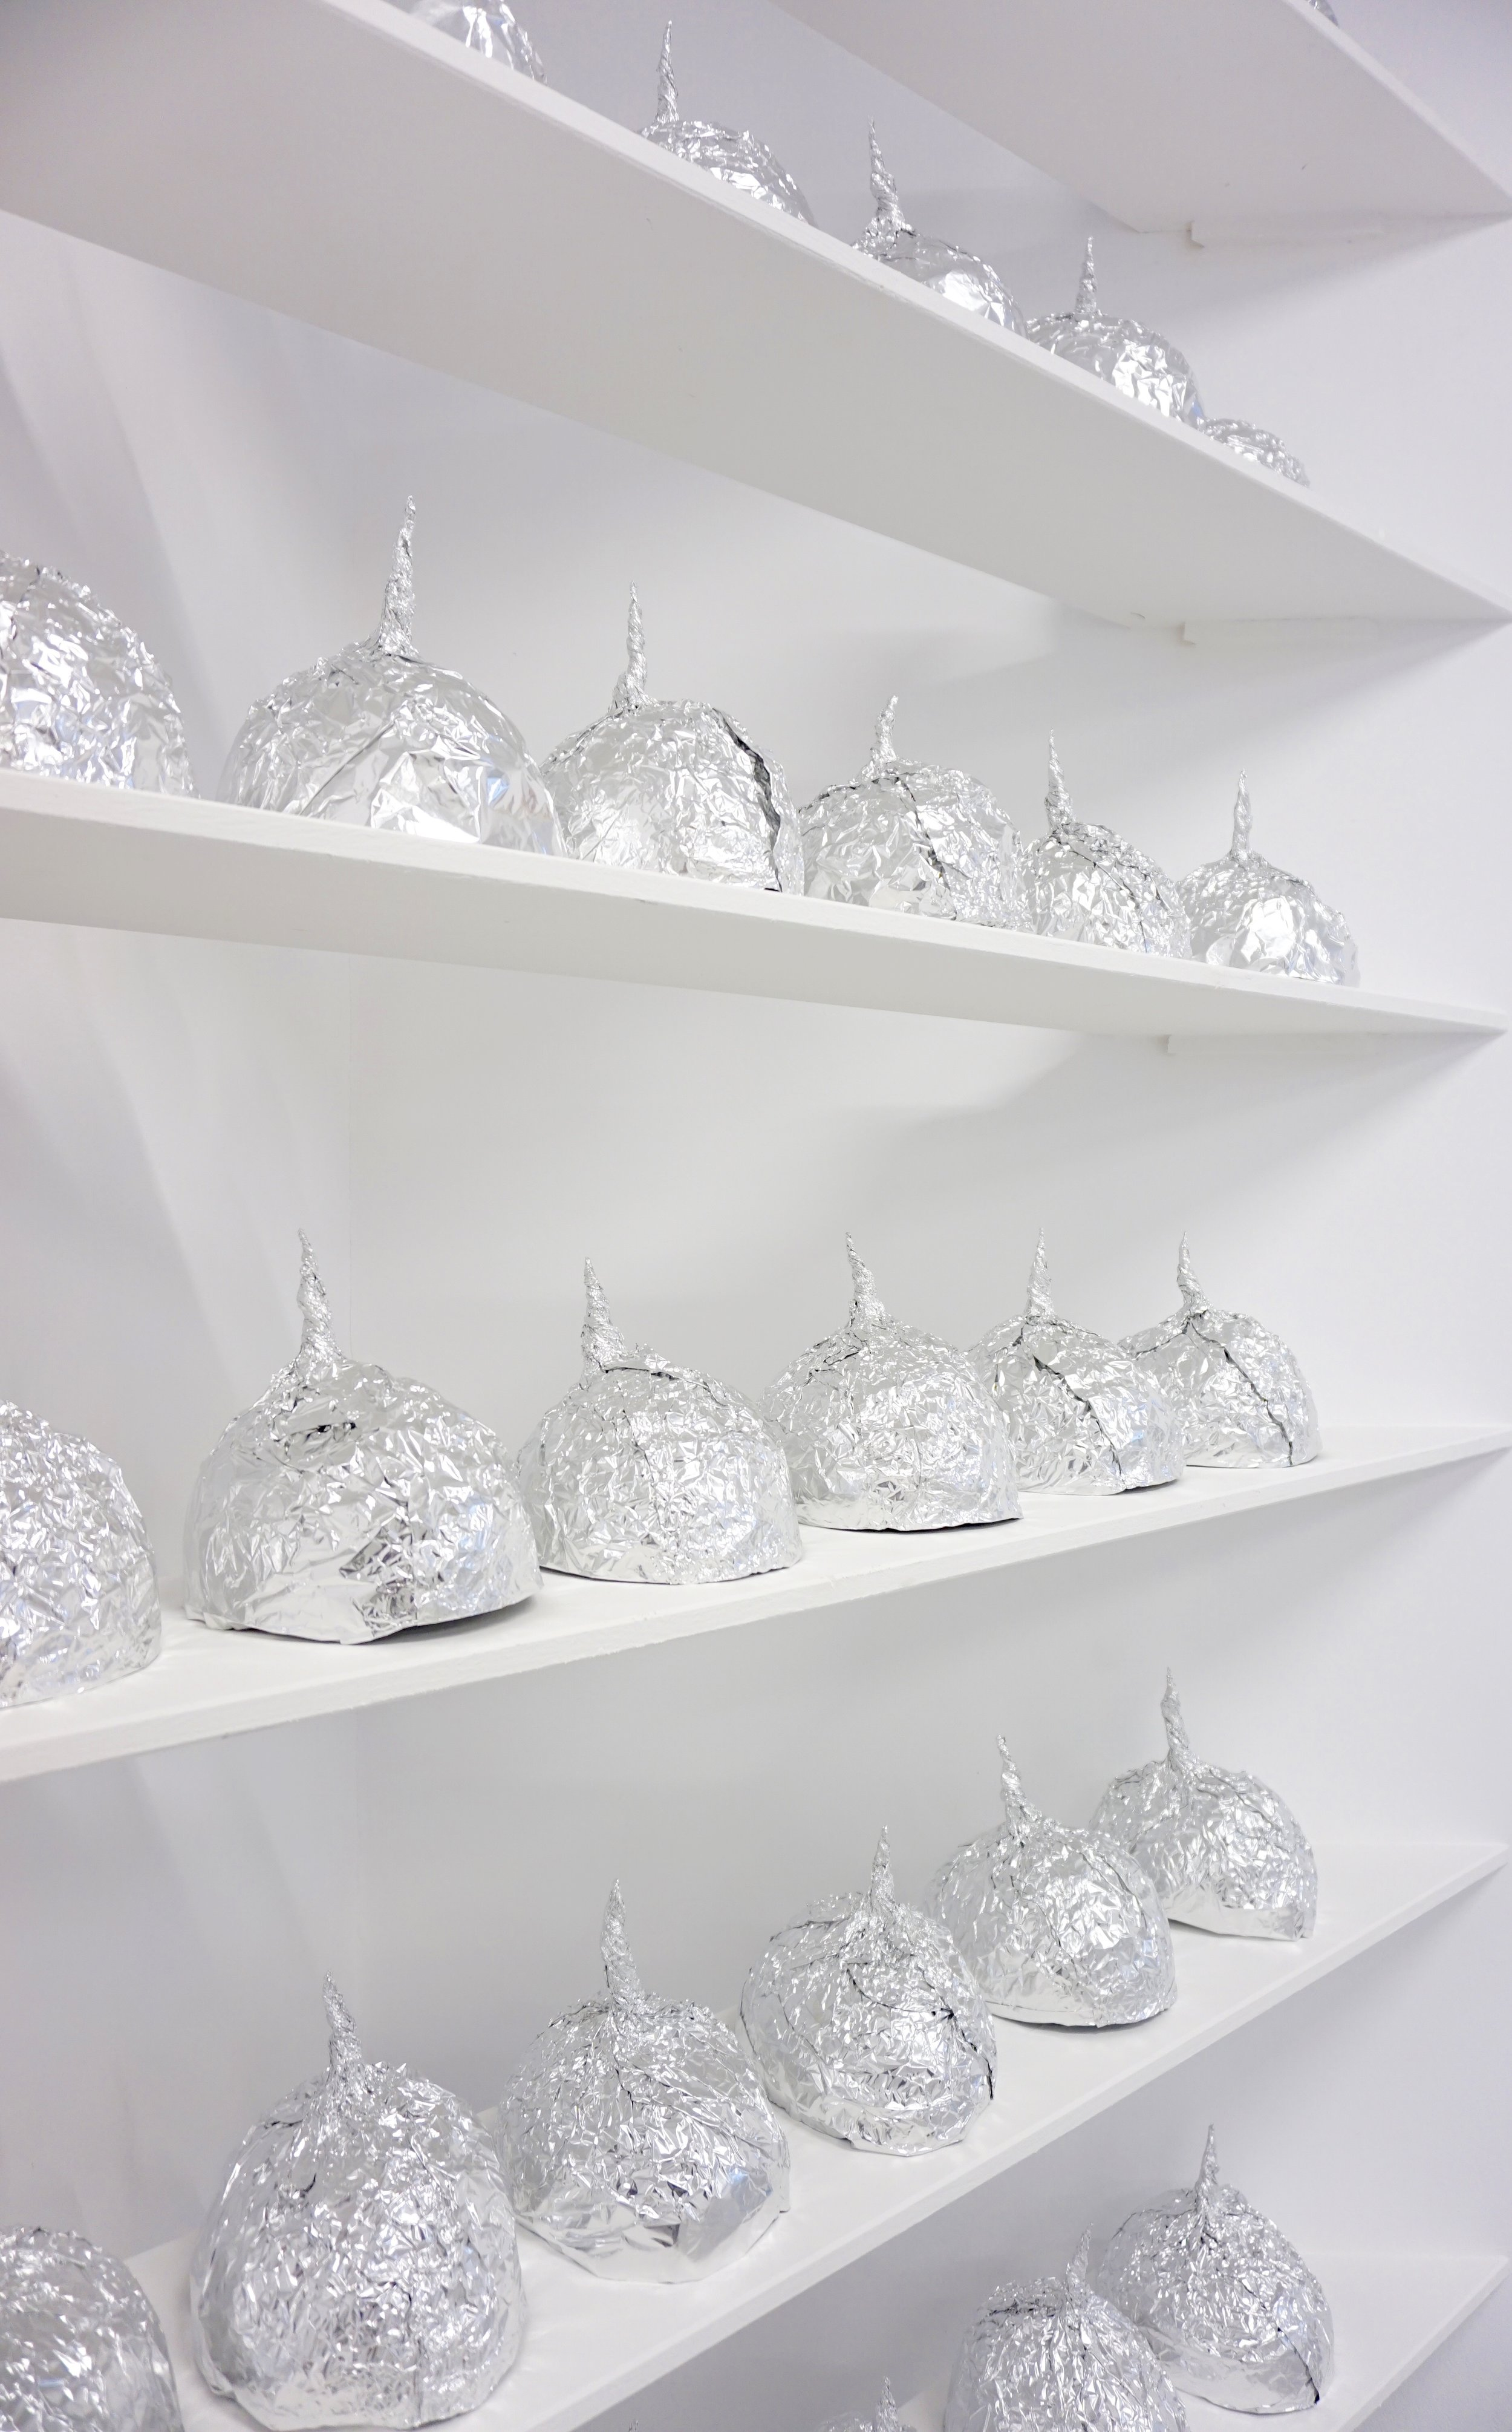 lukas liese installation postfaktum aluhüte tin foil hats sculpture.jpg